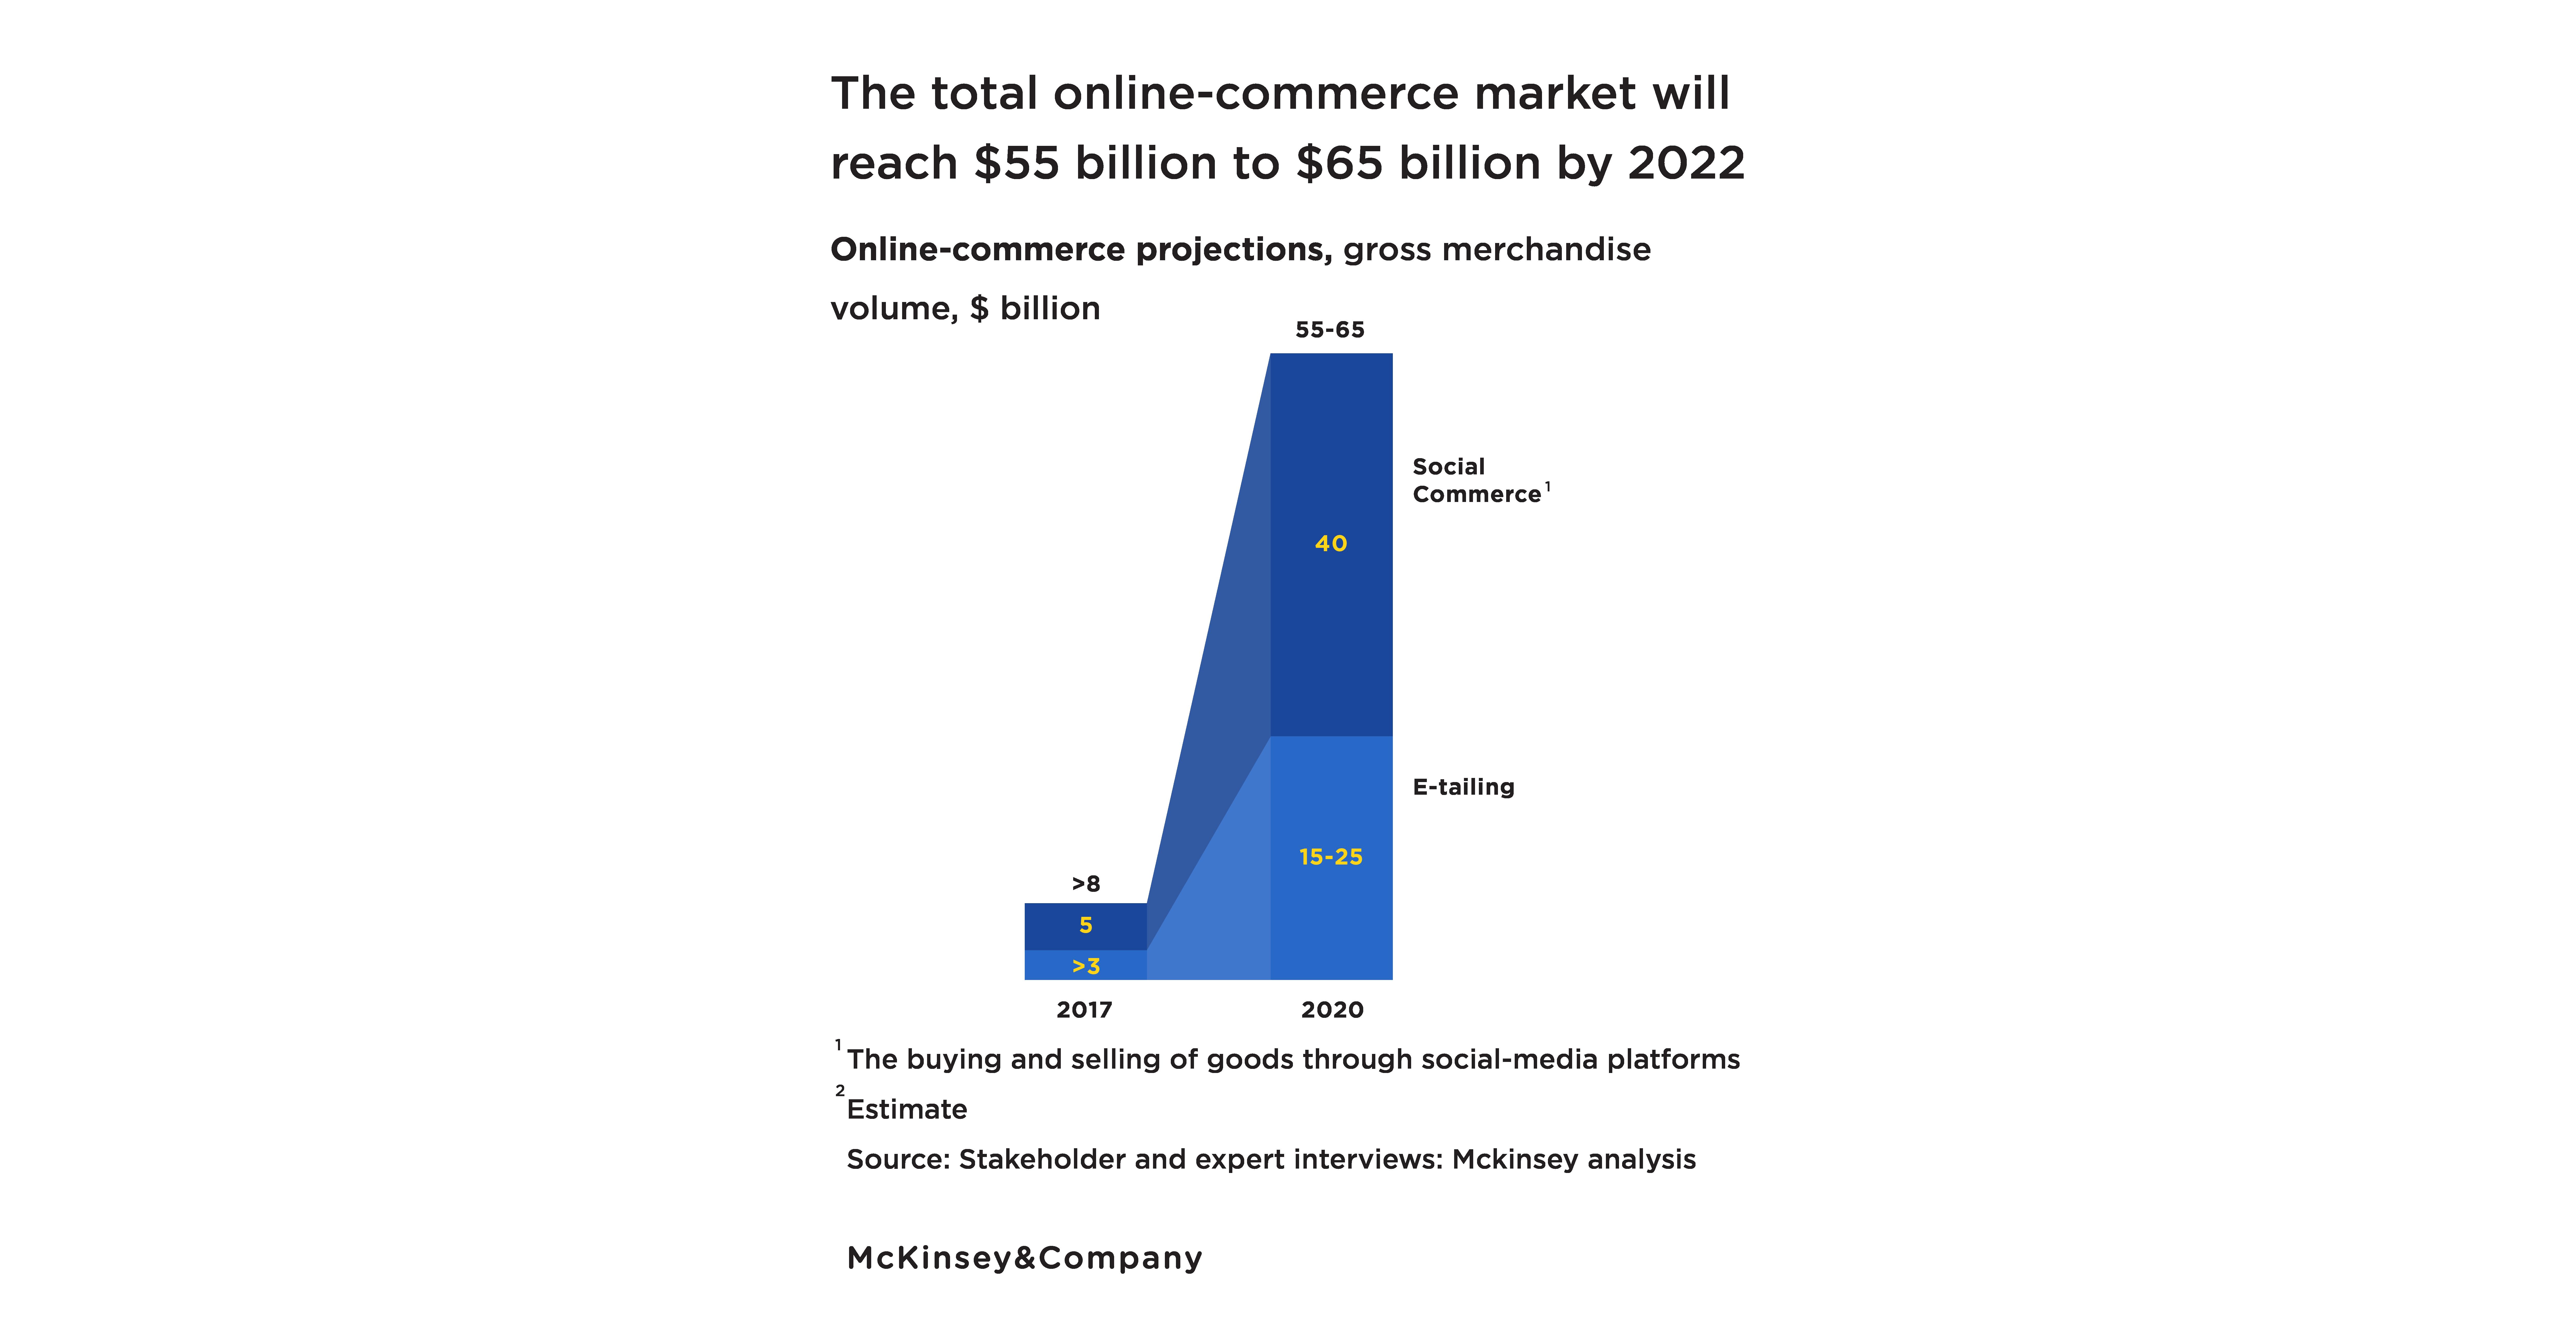 Social Commerce grow 8 folds